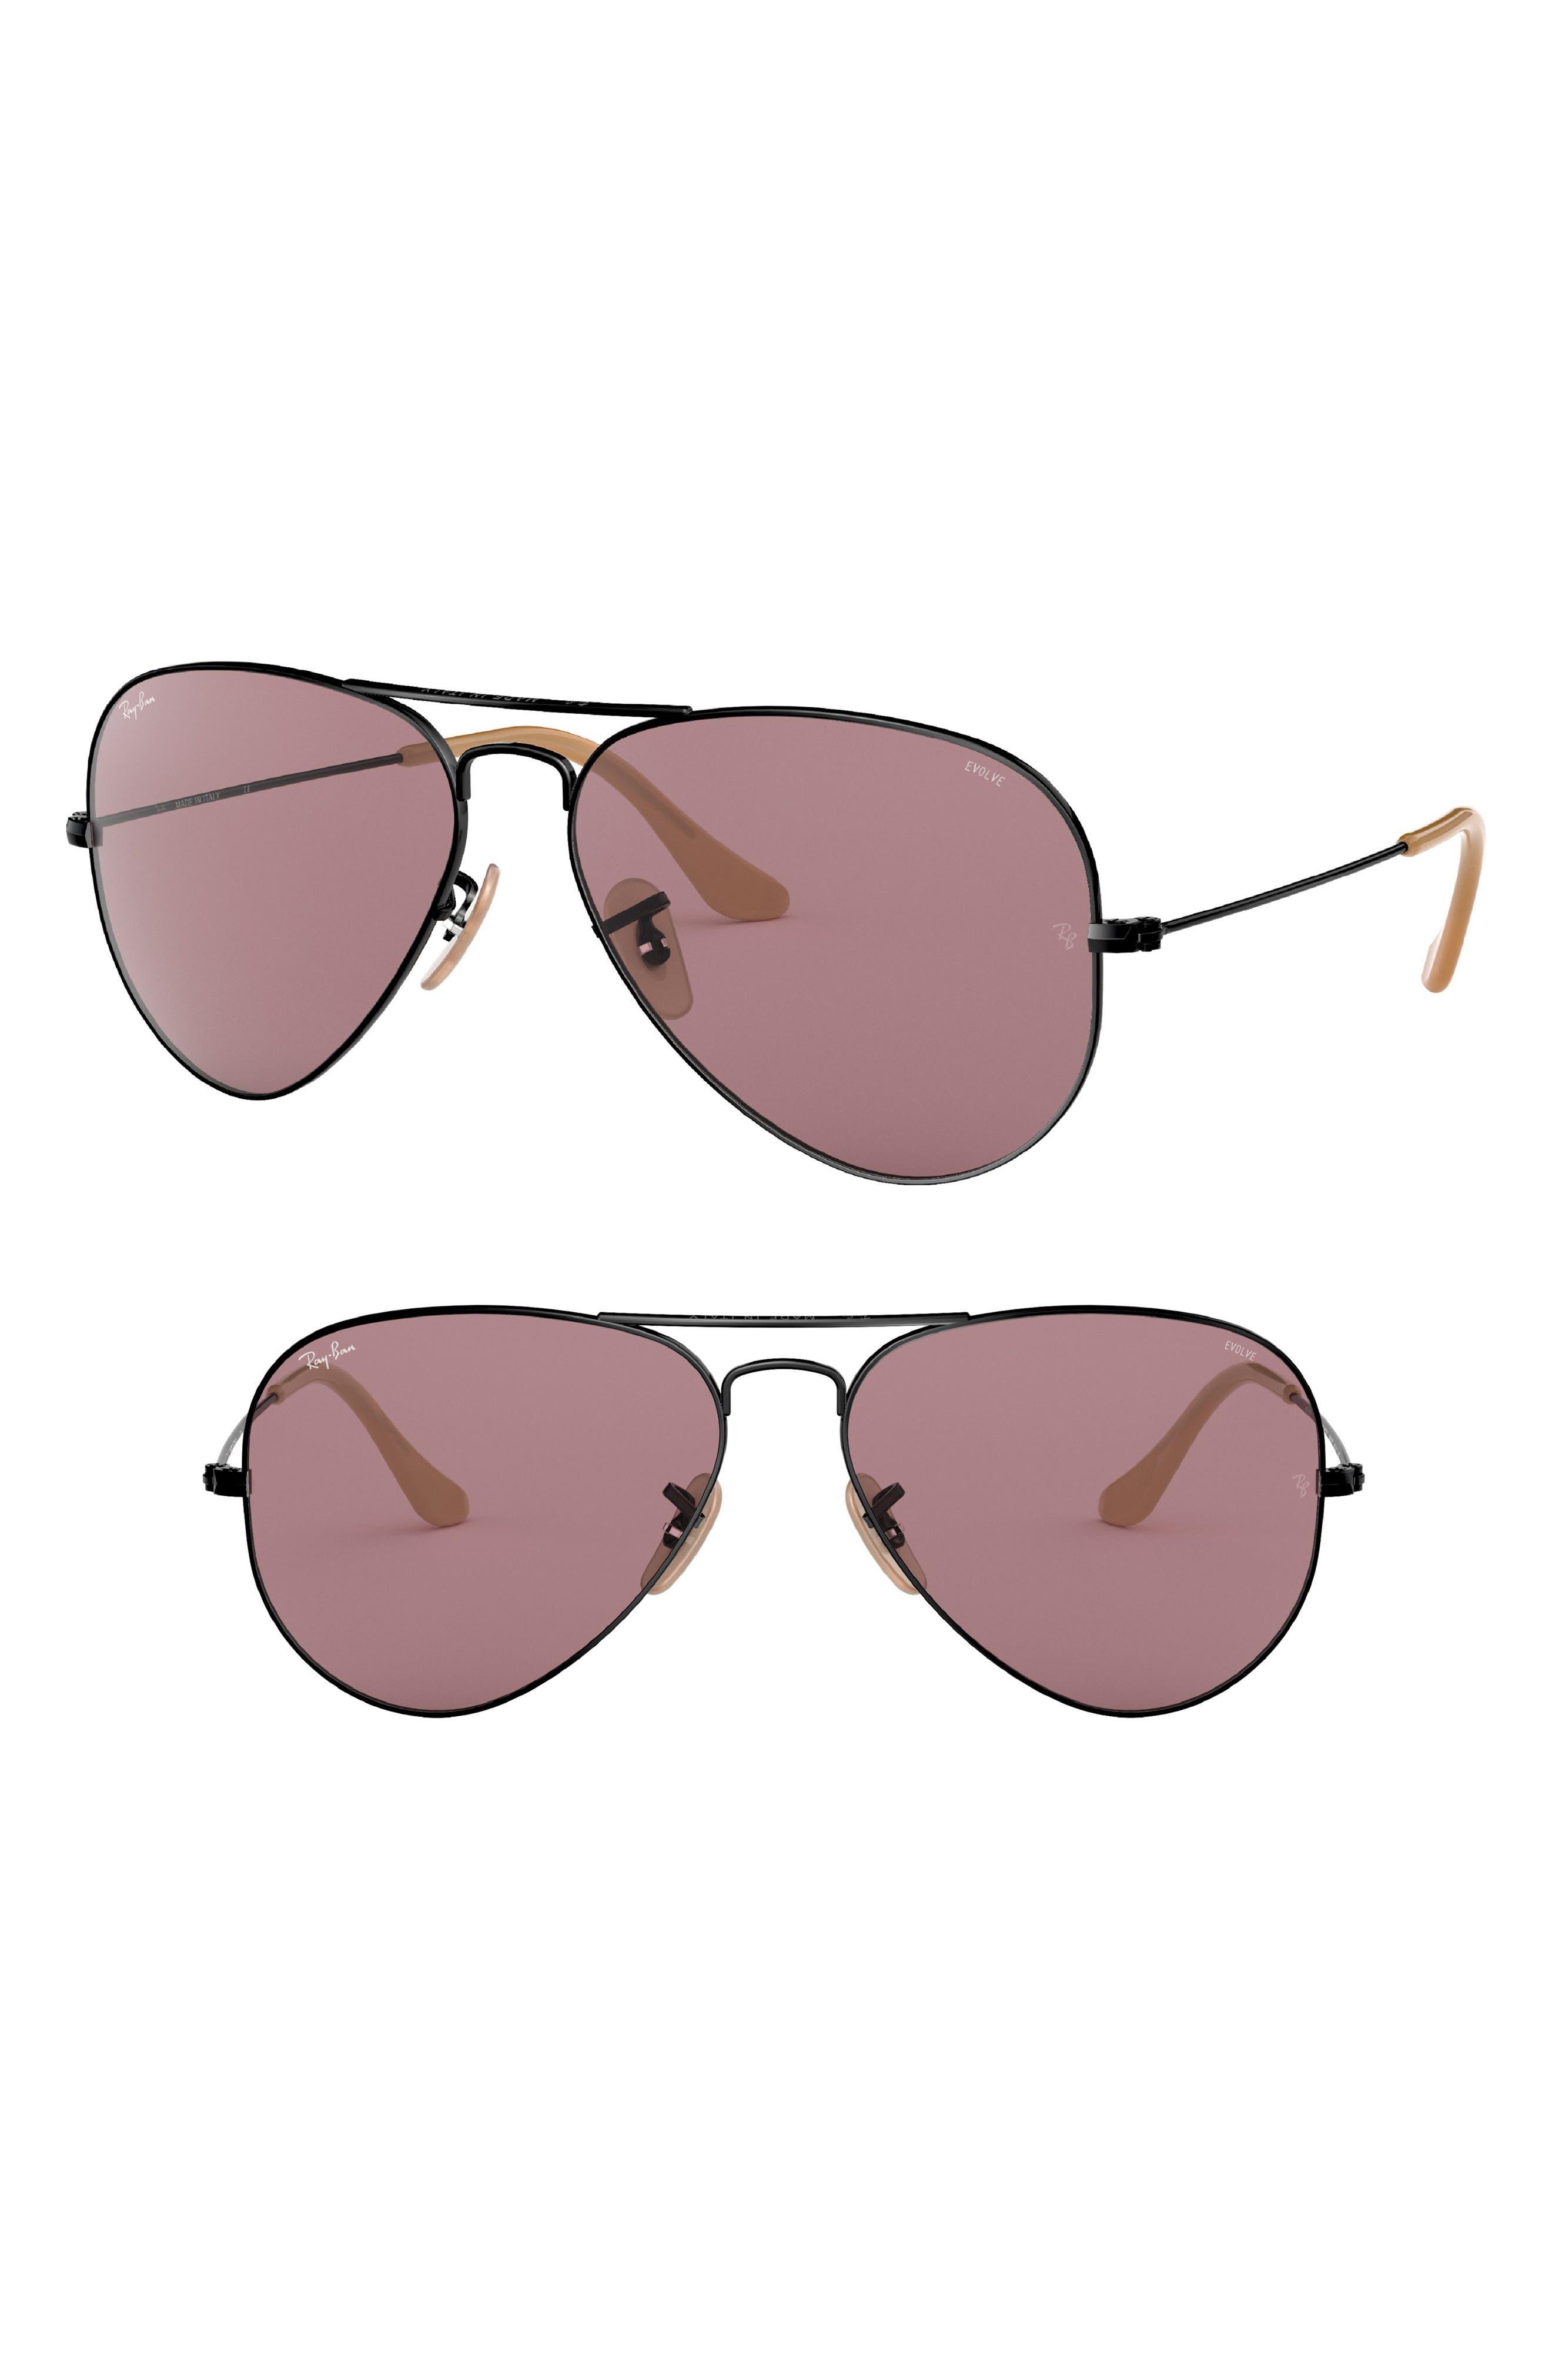 Evolve 55mm Photochromic Aviator Sunglasses,                         Main,                         color, Violet